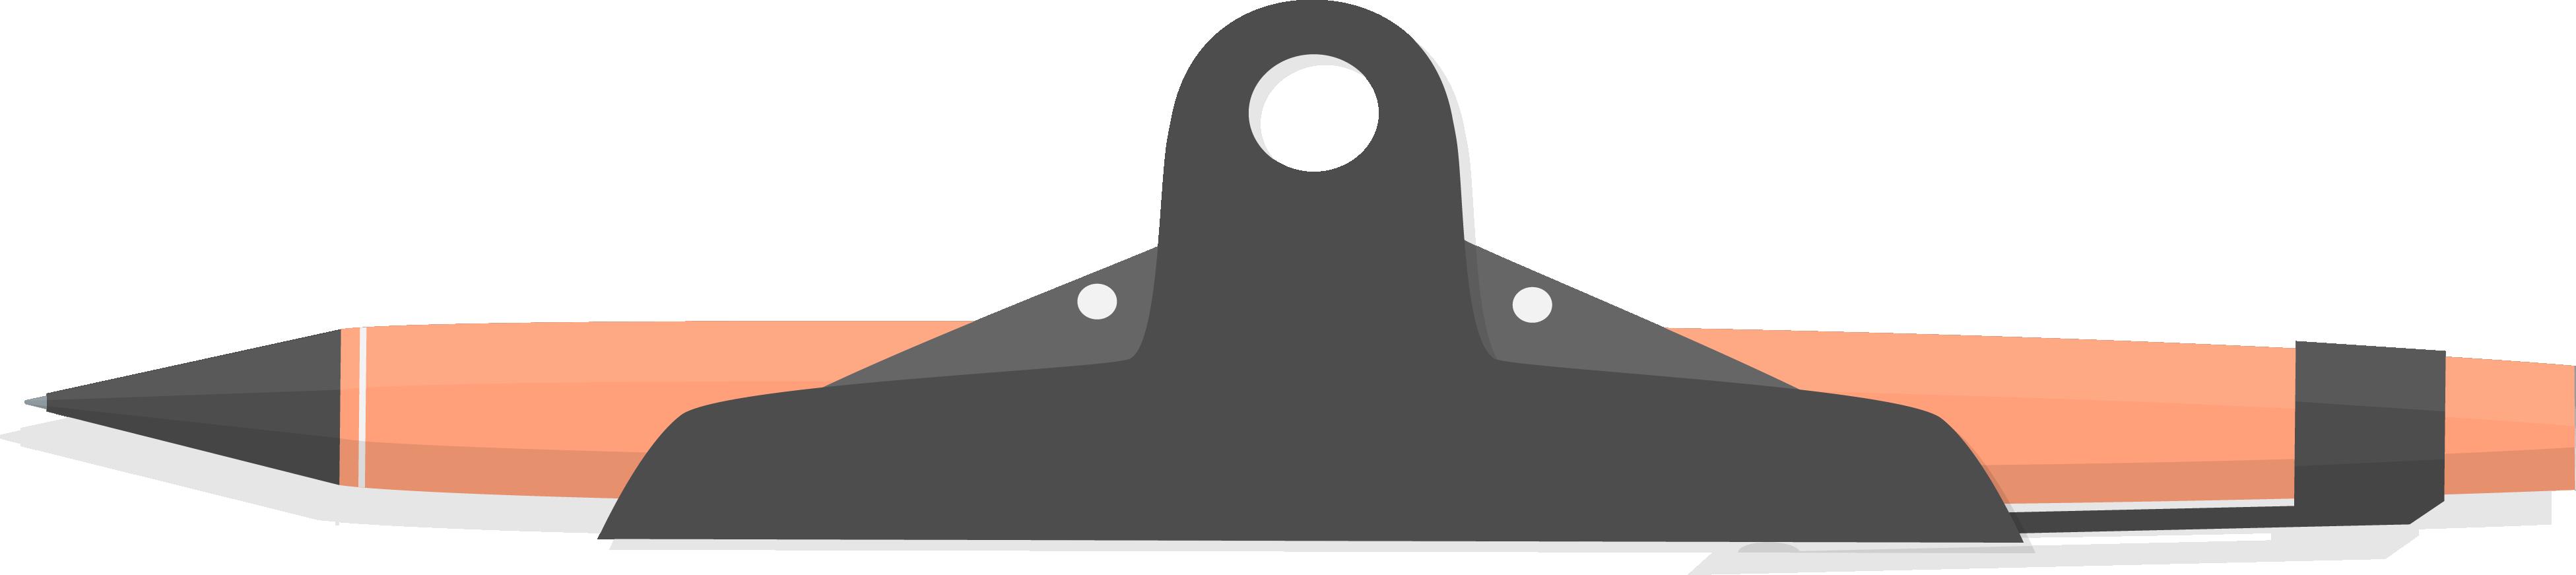 clipboard-top-anum